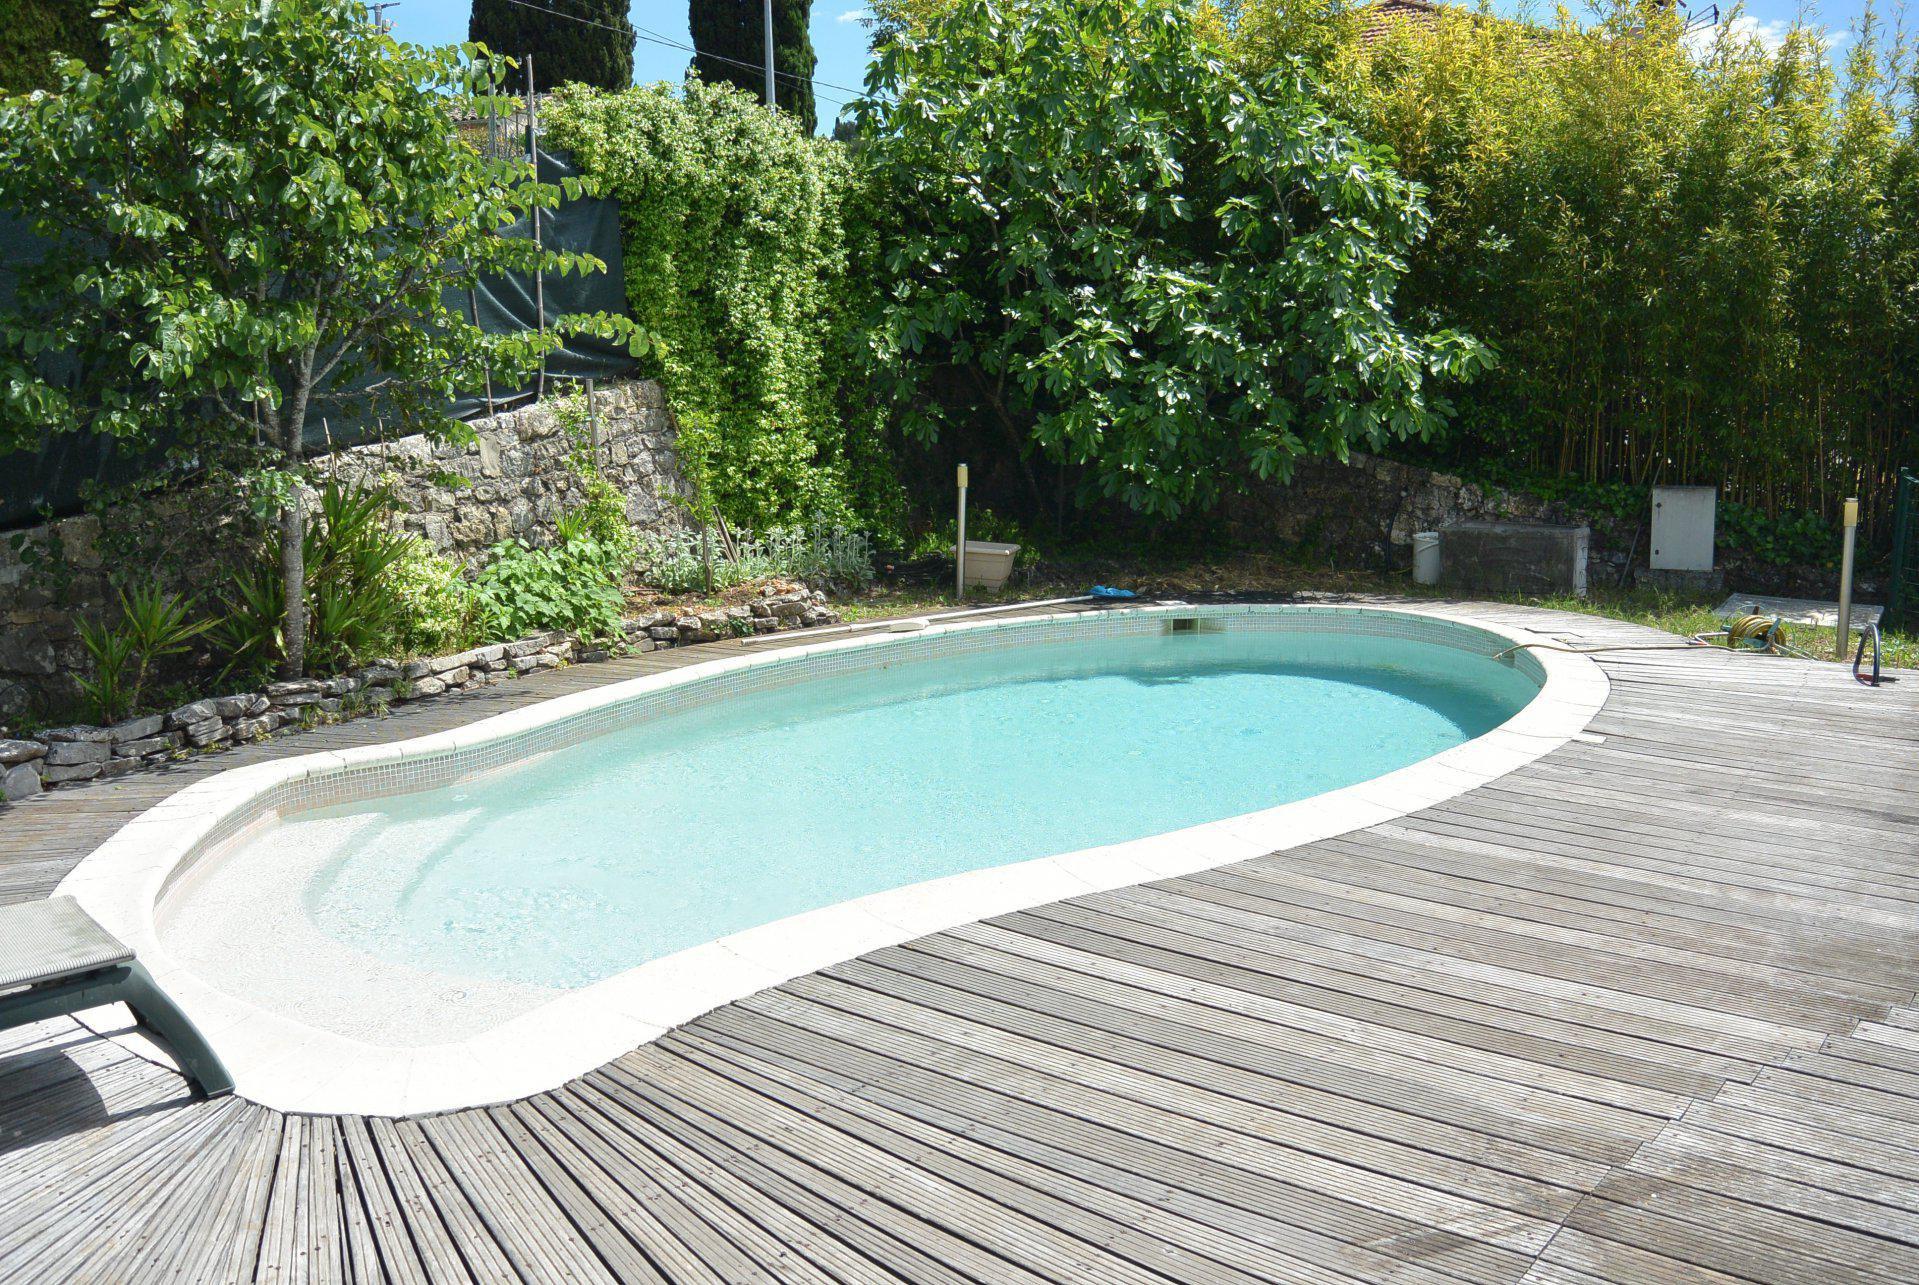 Vente Maison 230M² + Piscine Grasse St-Antoine destiné Piscine Grasse